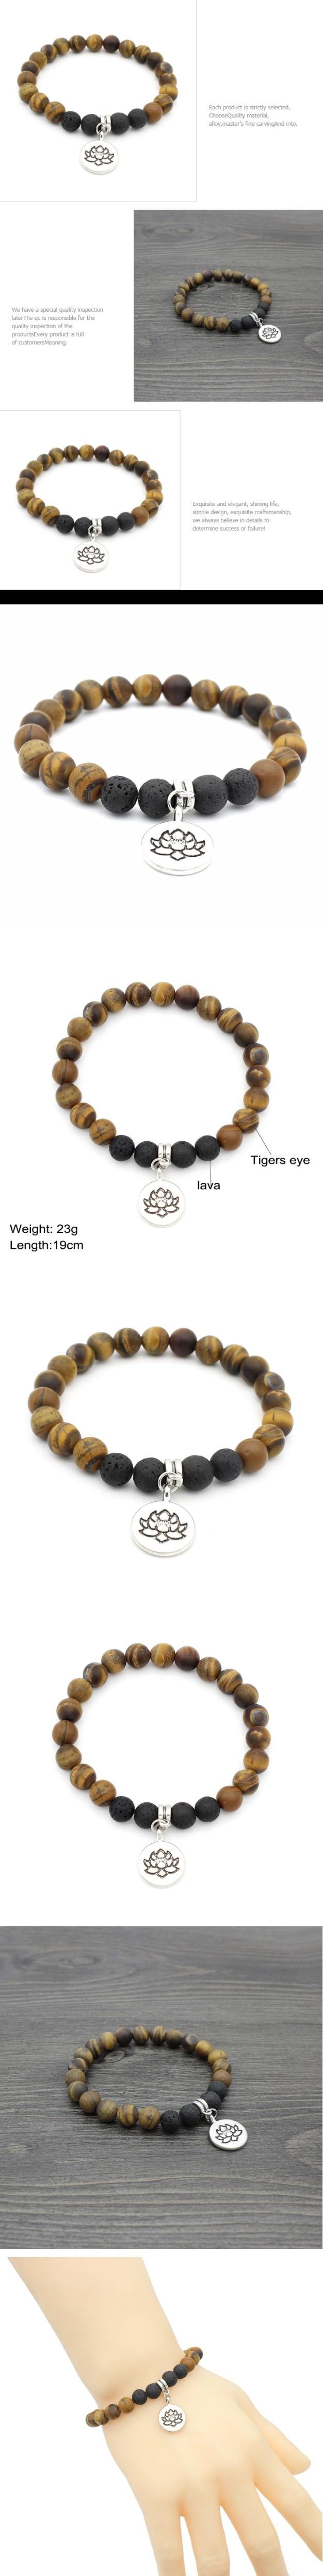 Tiger Eye Lava Stone Bracelets Women Buddha/Lotus/Ohm Charm Bracelet Men Beaded Bracelet For Women's Gift Yoga Jewelry Drop Ship